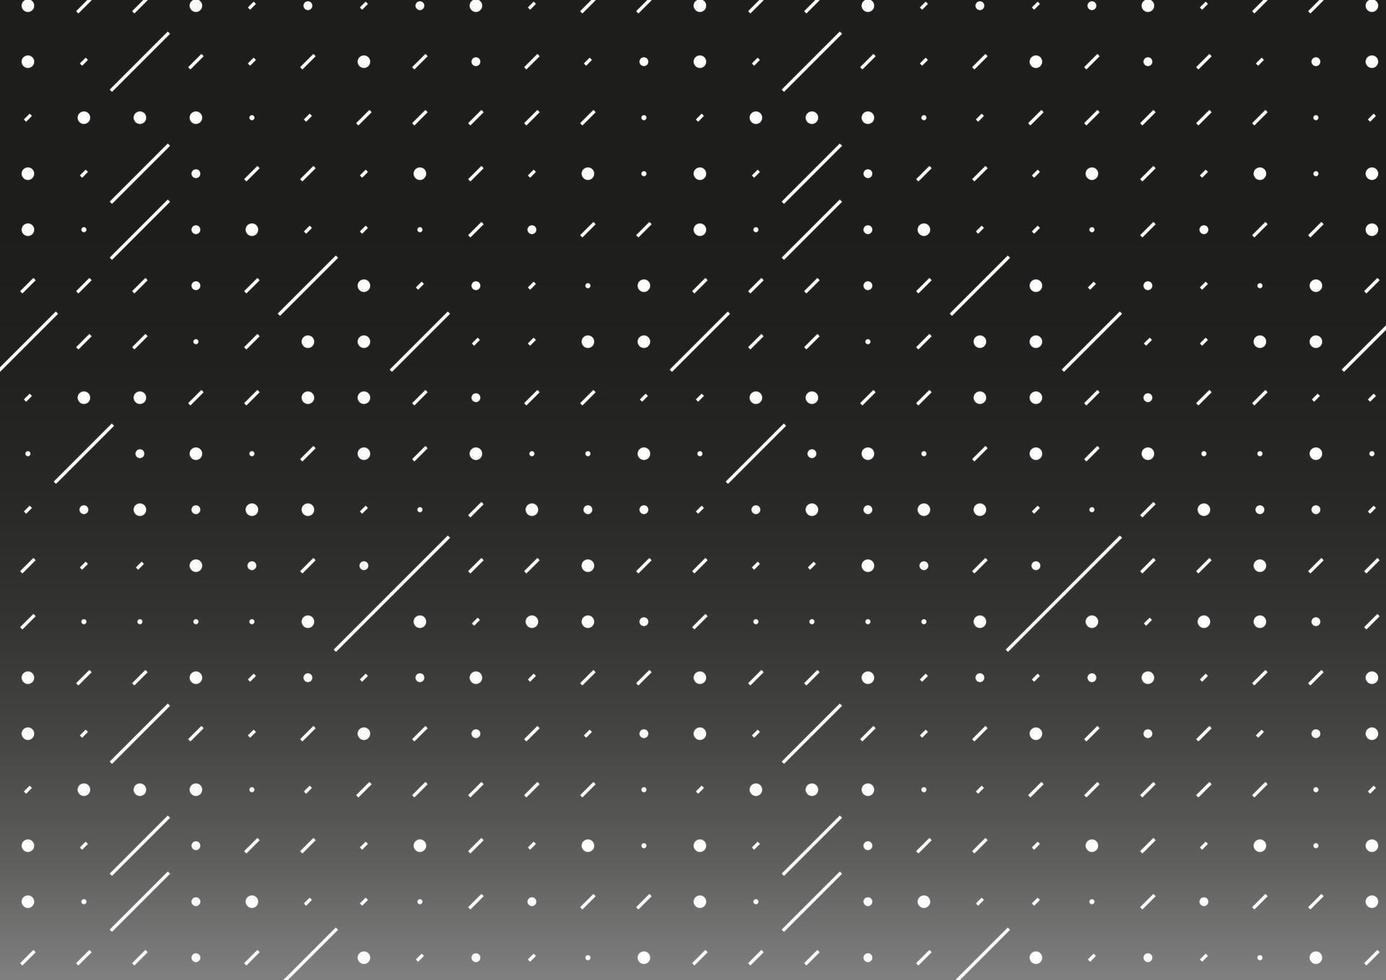 motivo geometrico piovoso con sfondo grigio sfumato. vettore